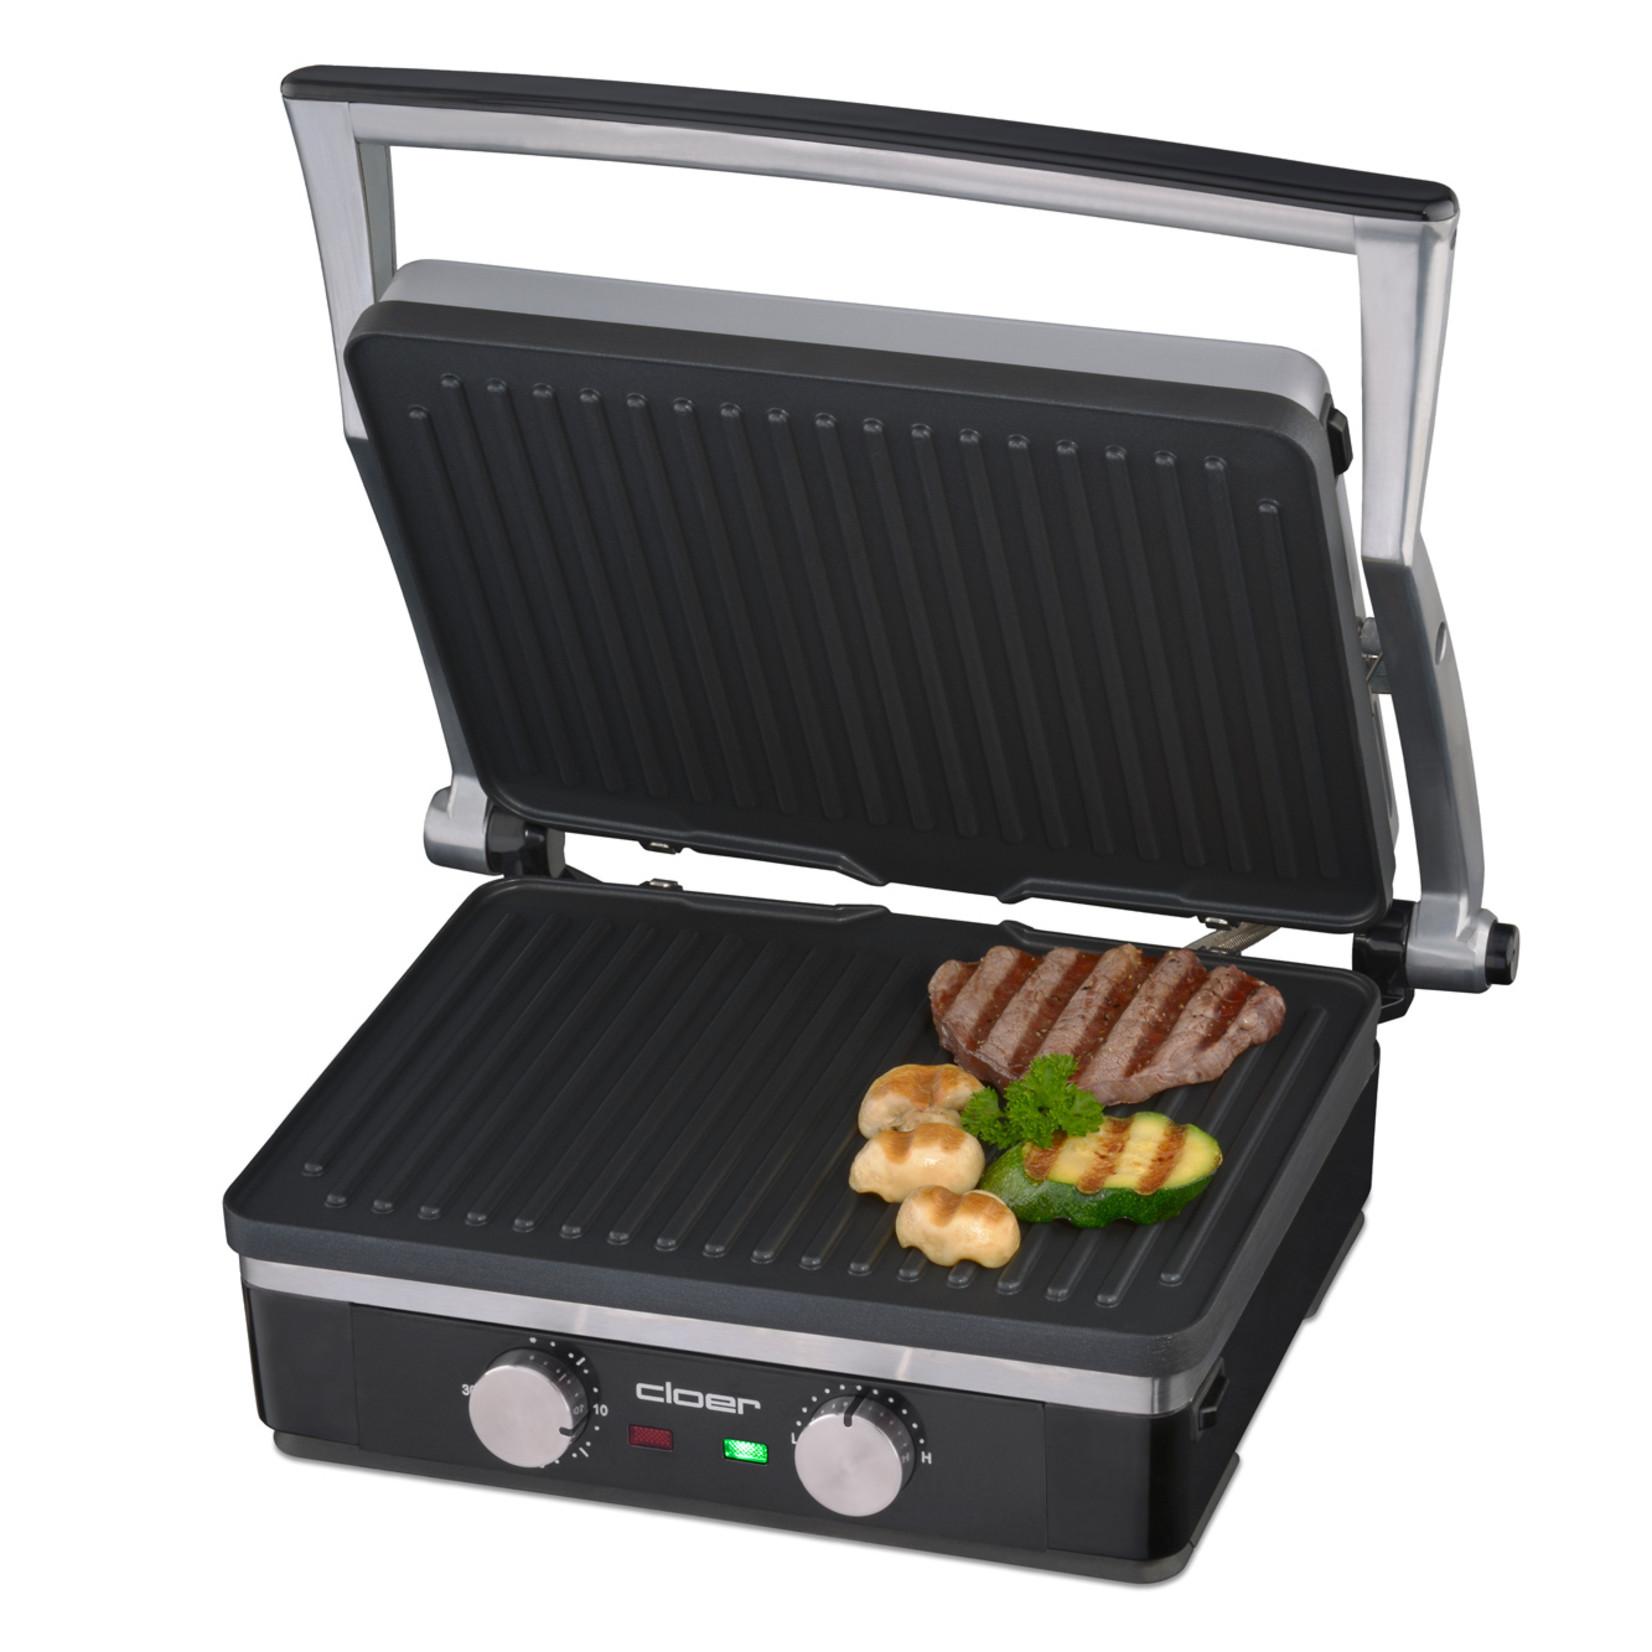 Cloer Cloer contact grill